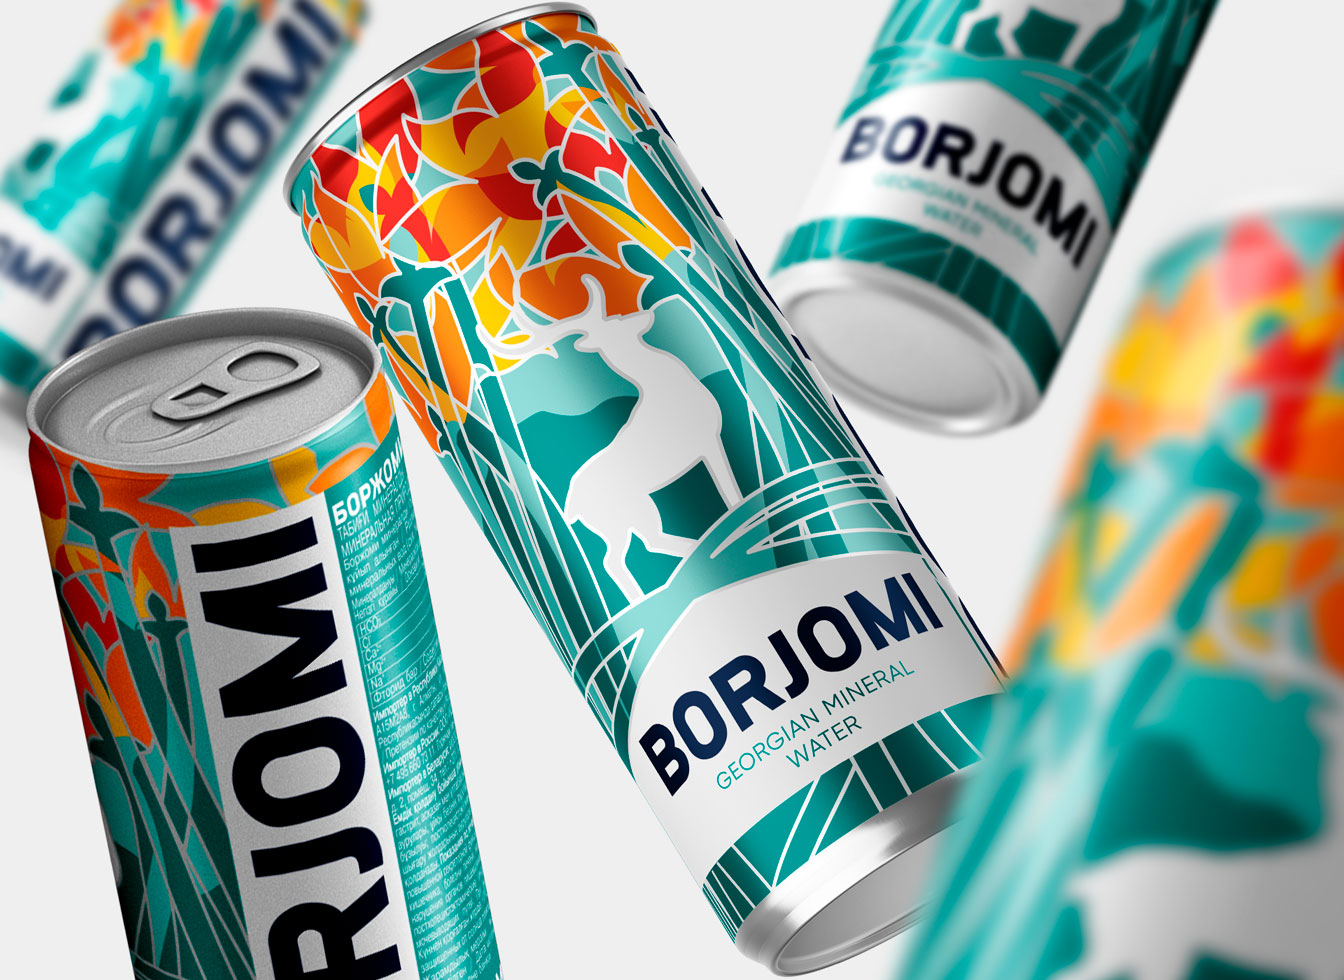 Borjomi Limited Edition Packaging for Nauryz Designed by BBDO Kazakhstan